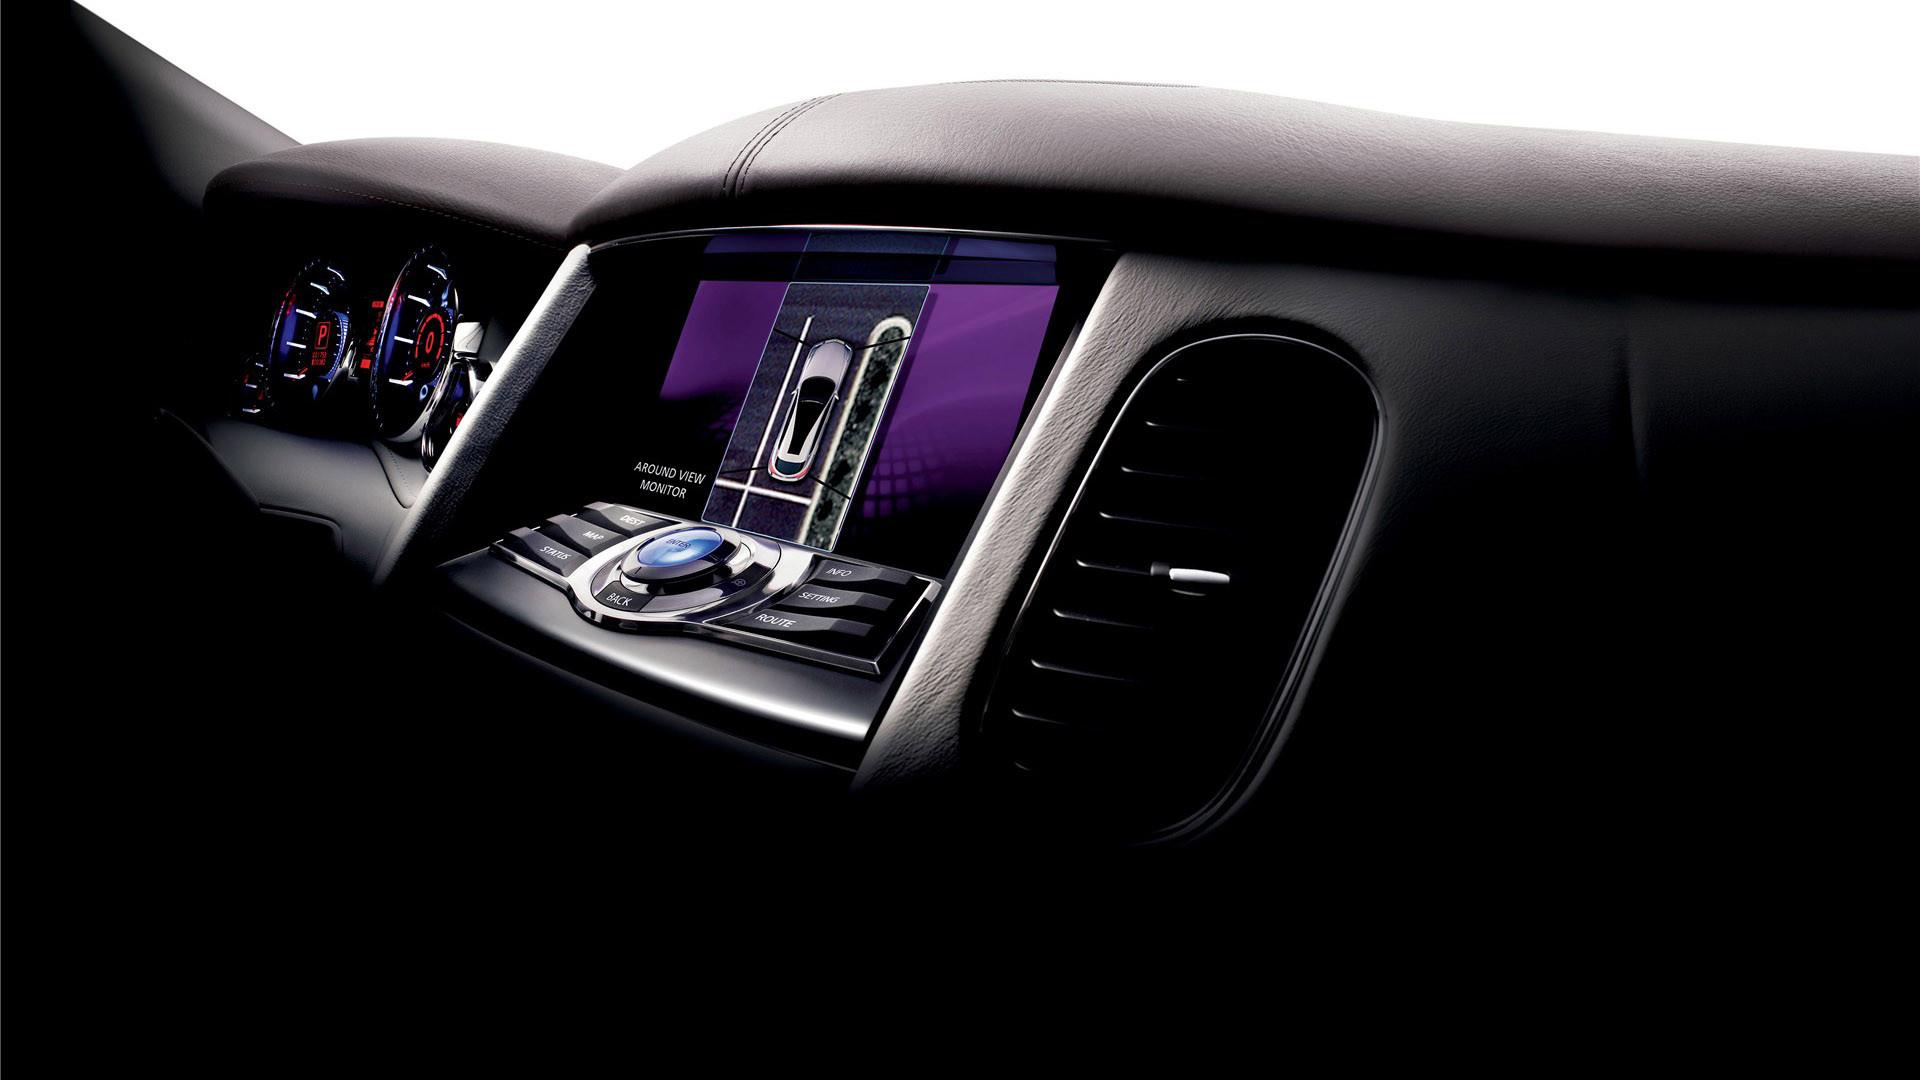 car interior wallpapers. Black Bedroom Furniture Sets. Home Design Ideas